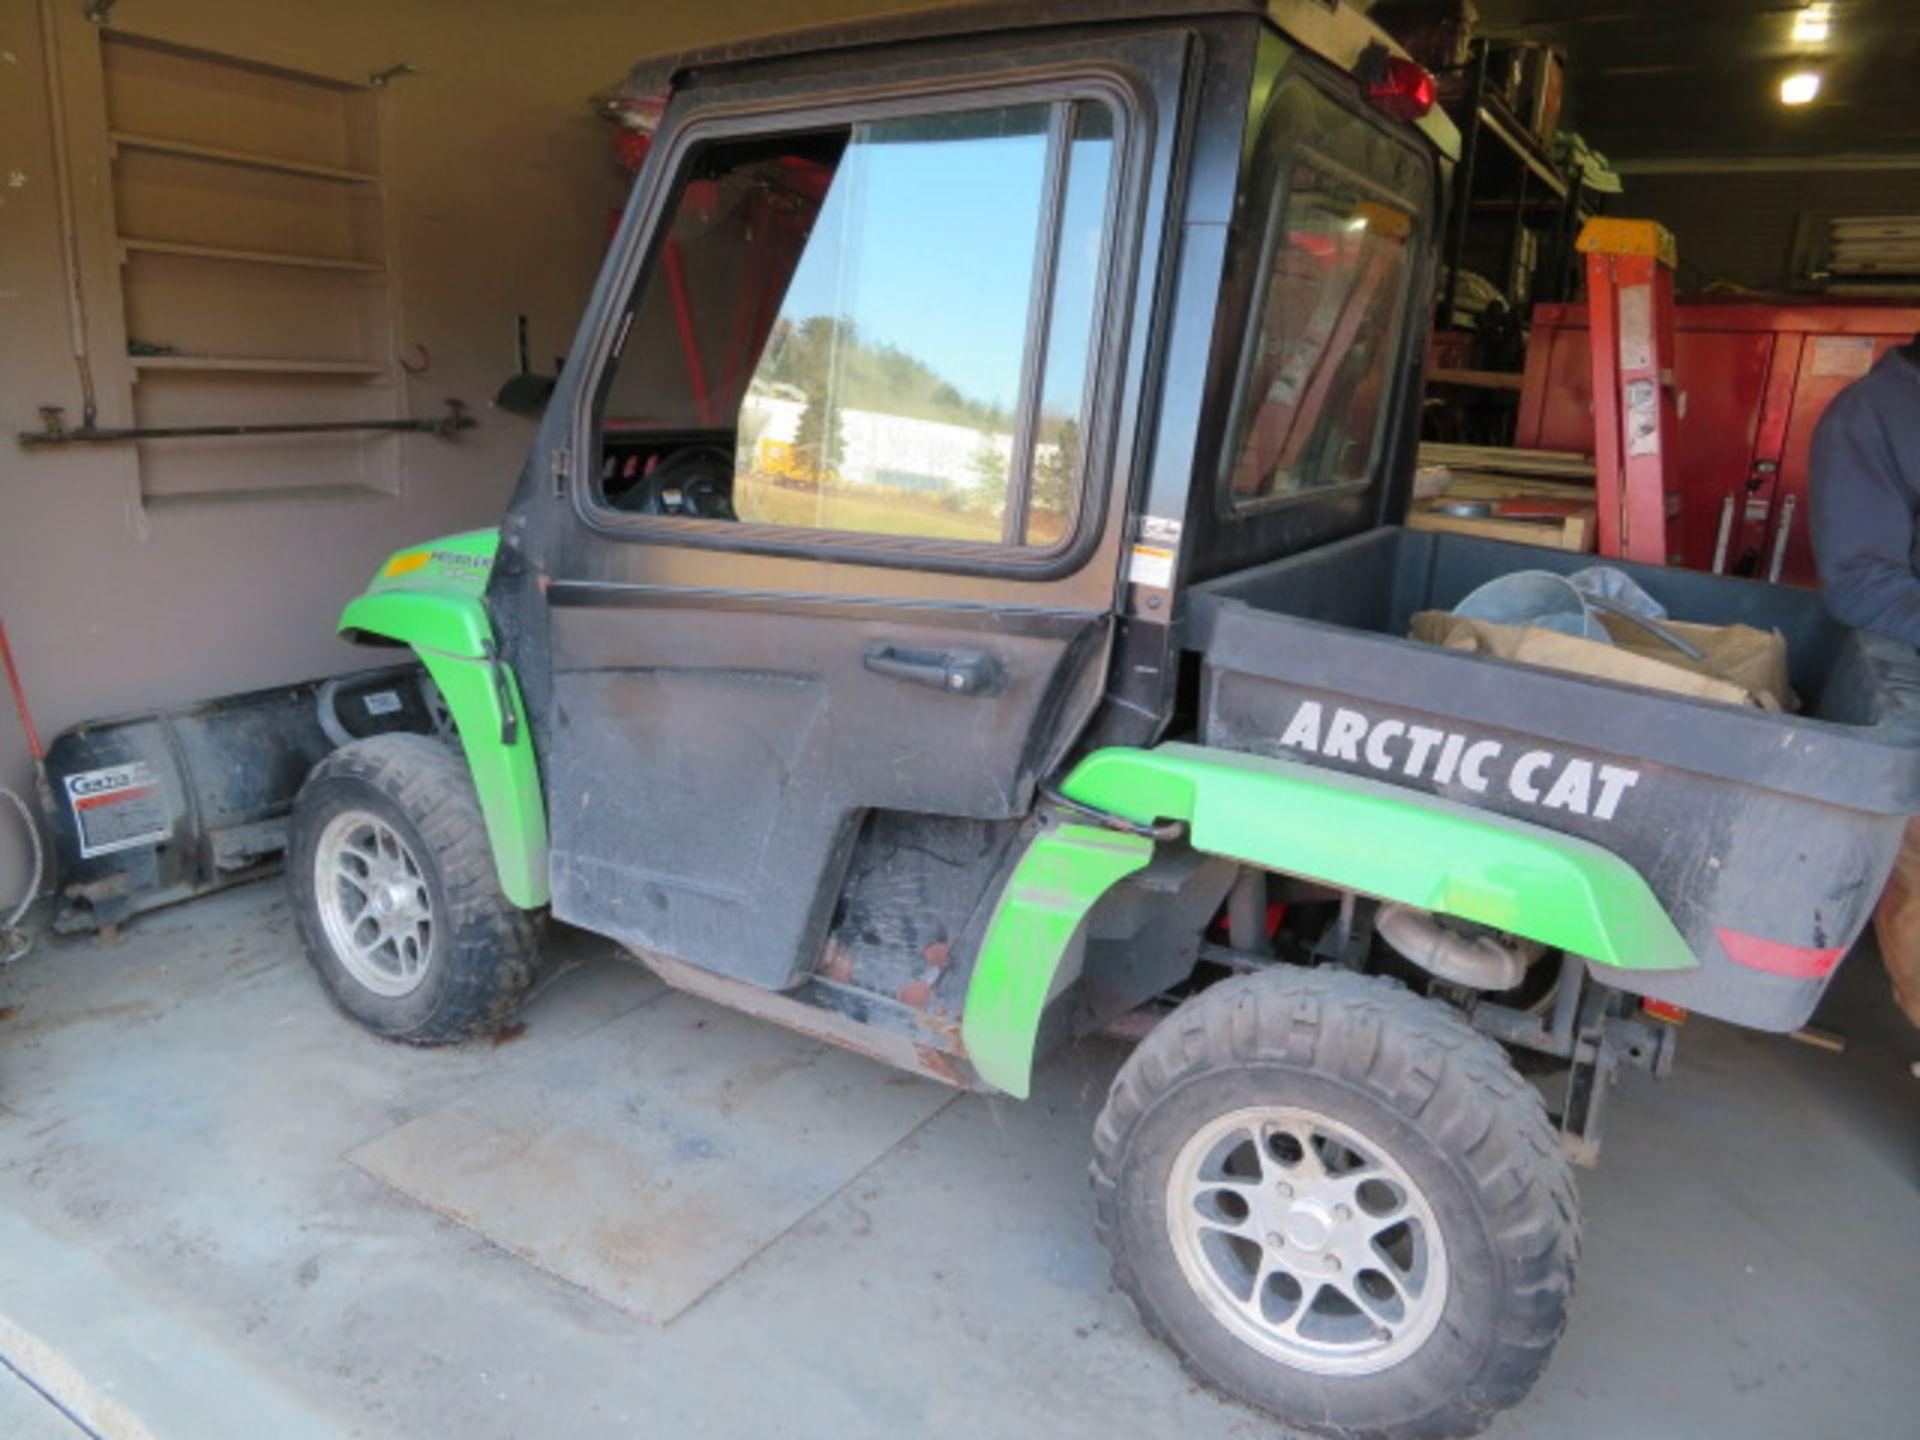 Lot 0C - ARCTIC CAT 4WD ALL-TERRAIN VEHICLE